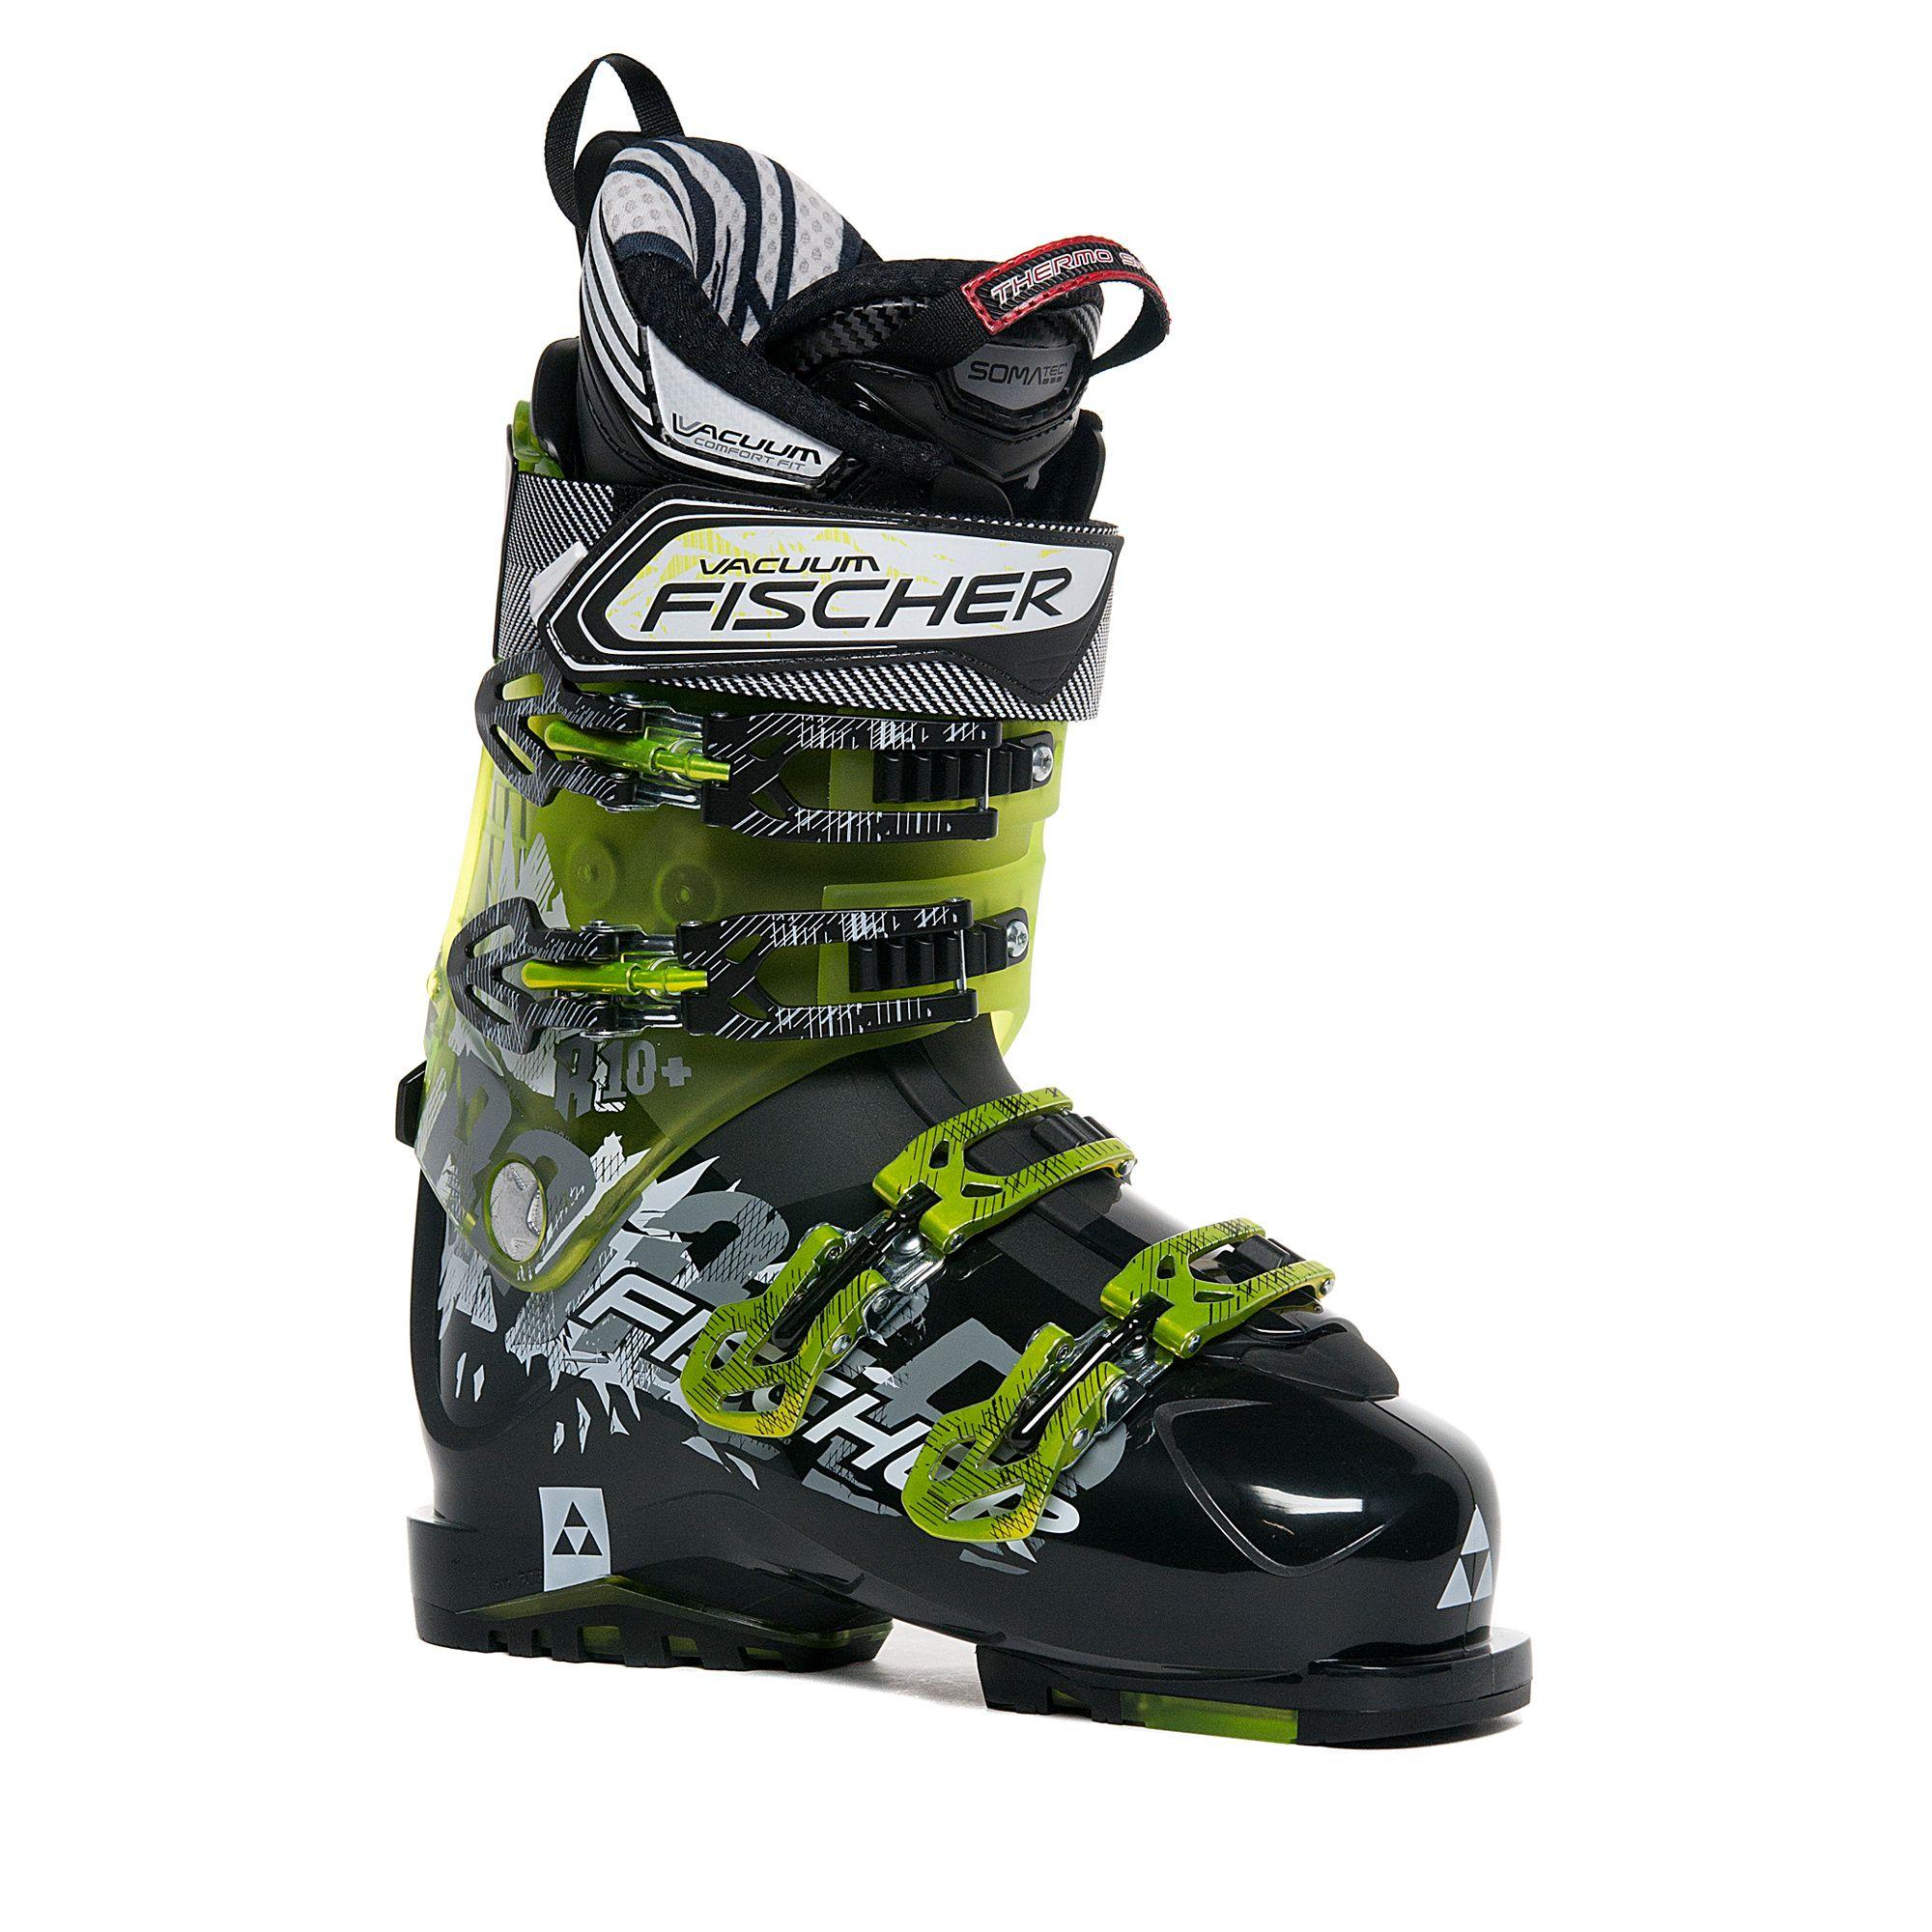 FISCHER SPORTS Men's Ranger 10+ Vacuum Ski Boots